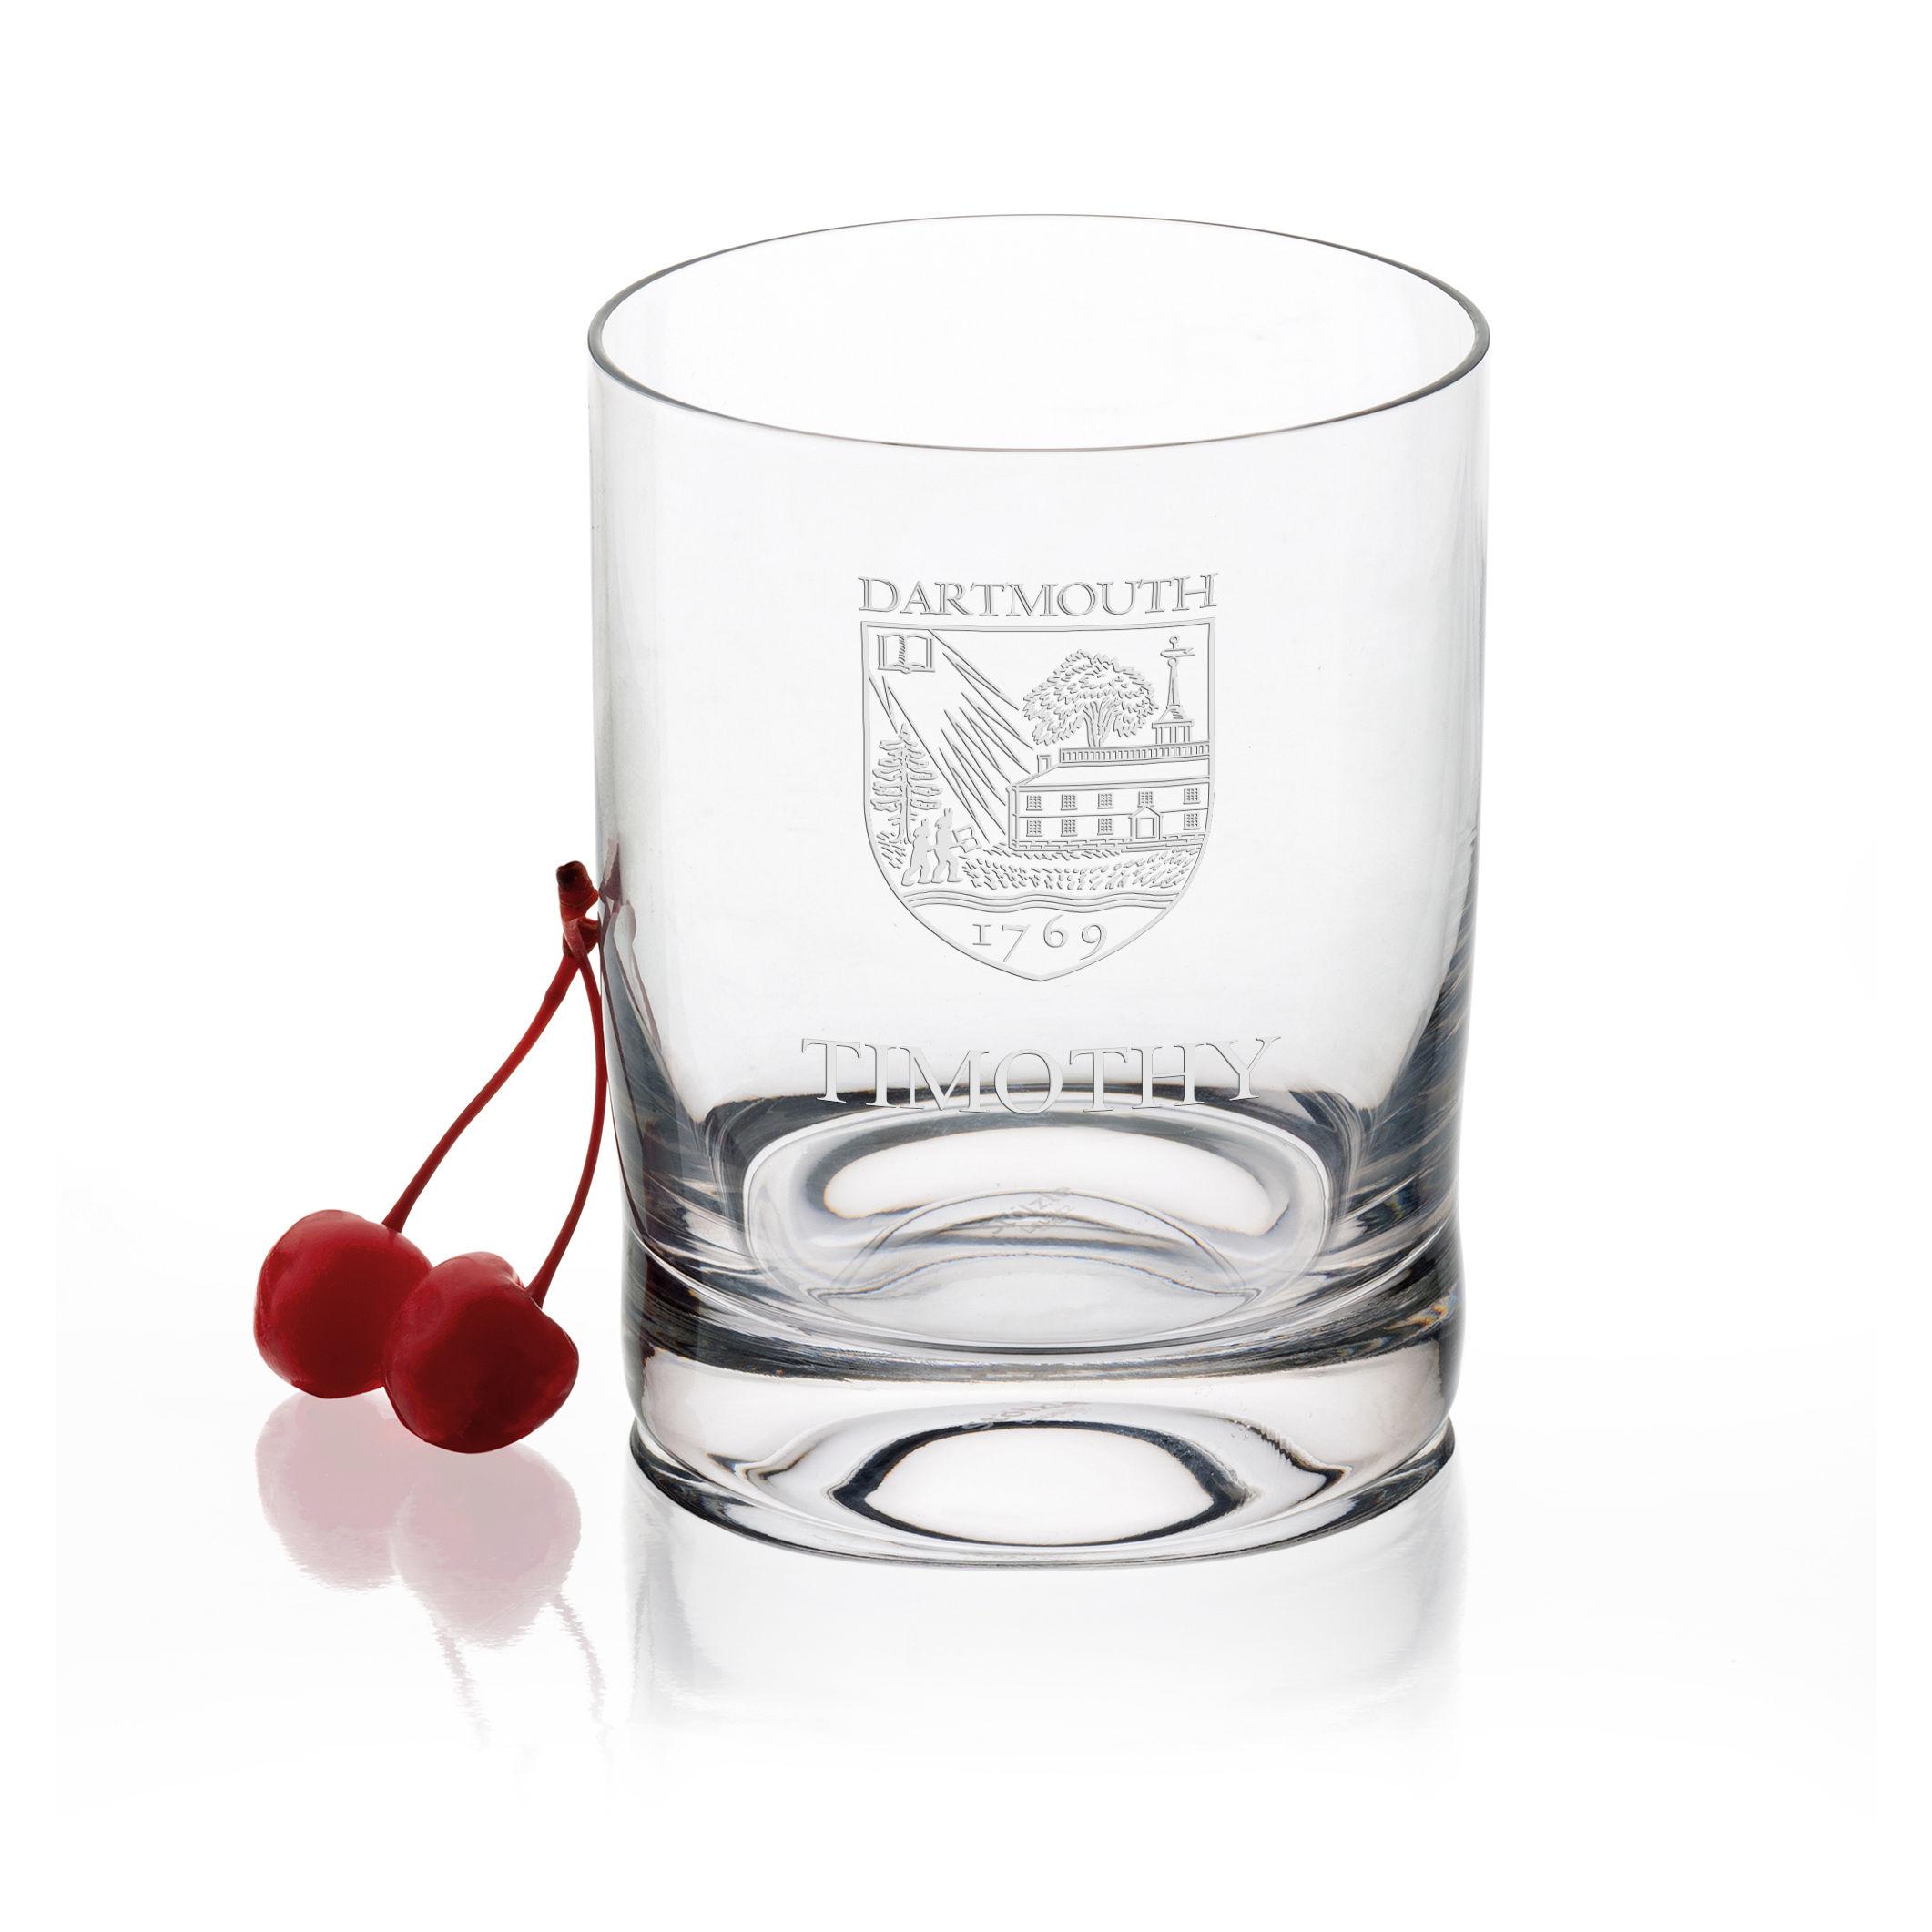 Dartmouth College Tumbler Glasses - Set of 4